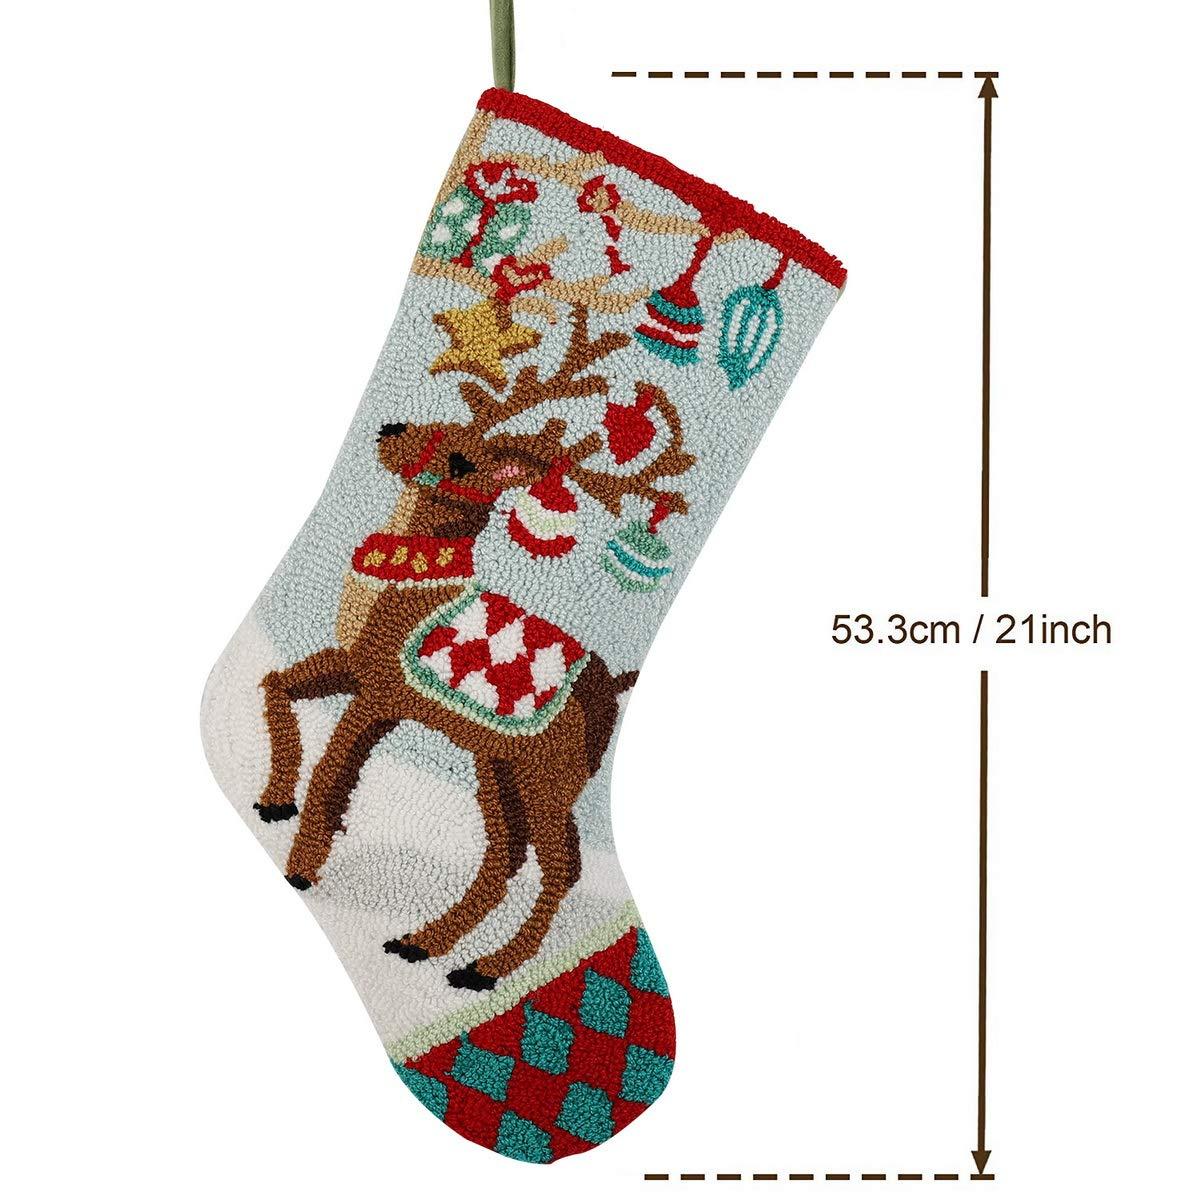 "Amazon.com: Alice Doria 21"" Handmade Hooked Reindeer Christmas ..."